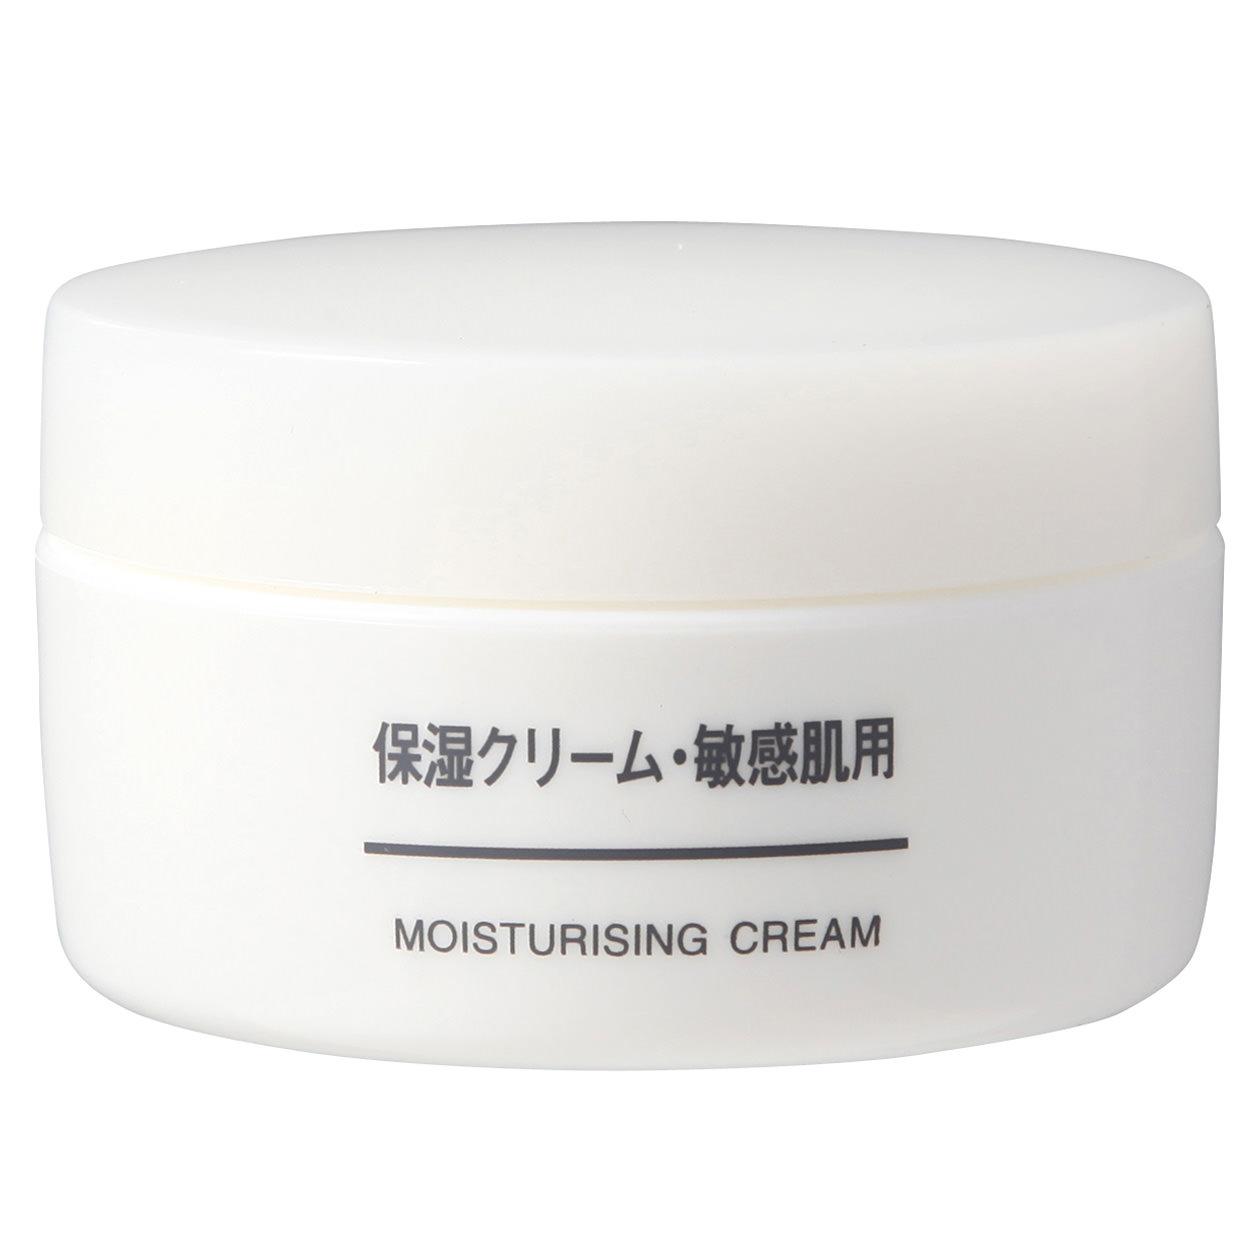 Crema hidratante japonesa Muji. Moisturising Cream